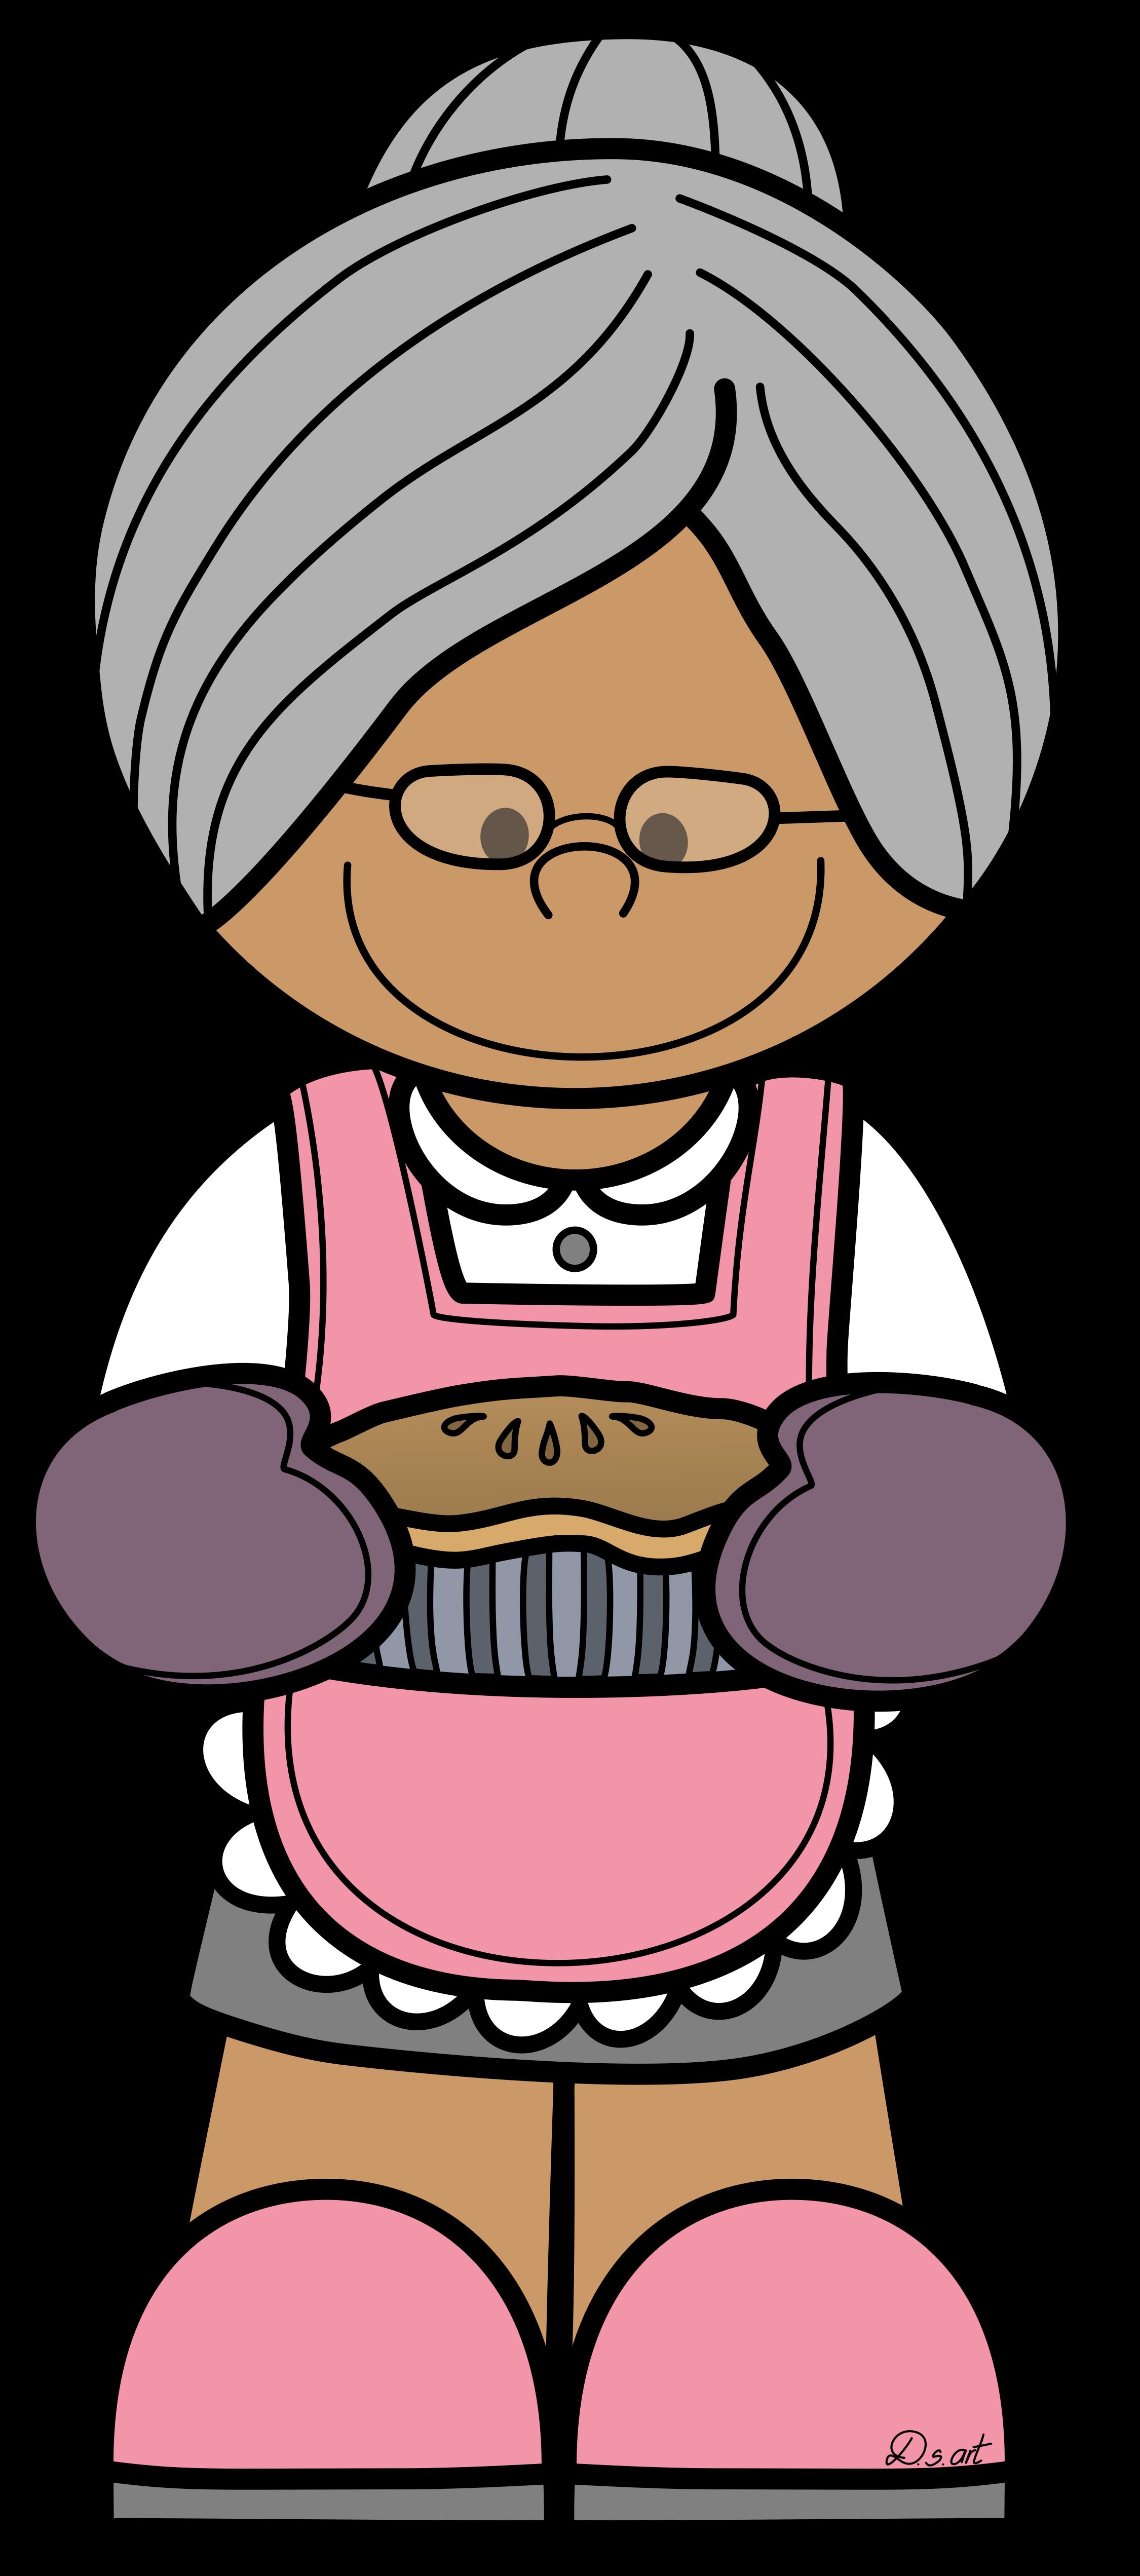 Abuela. Grandma clipart hip